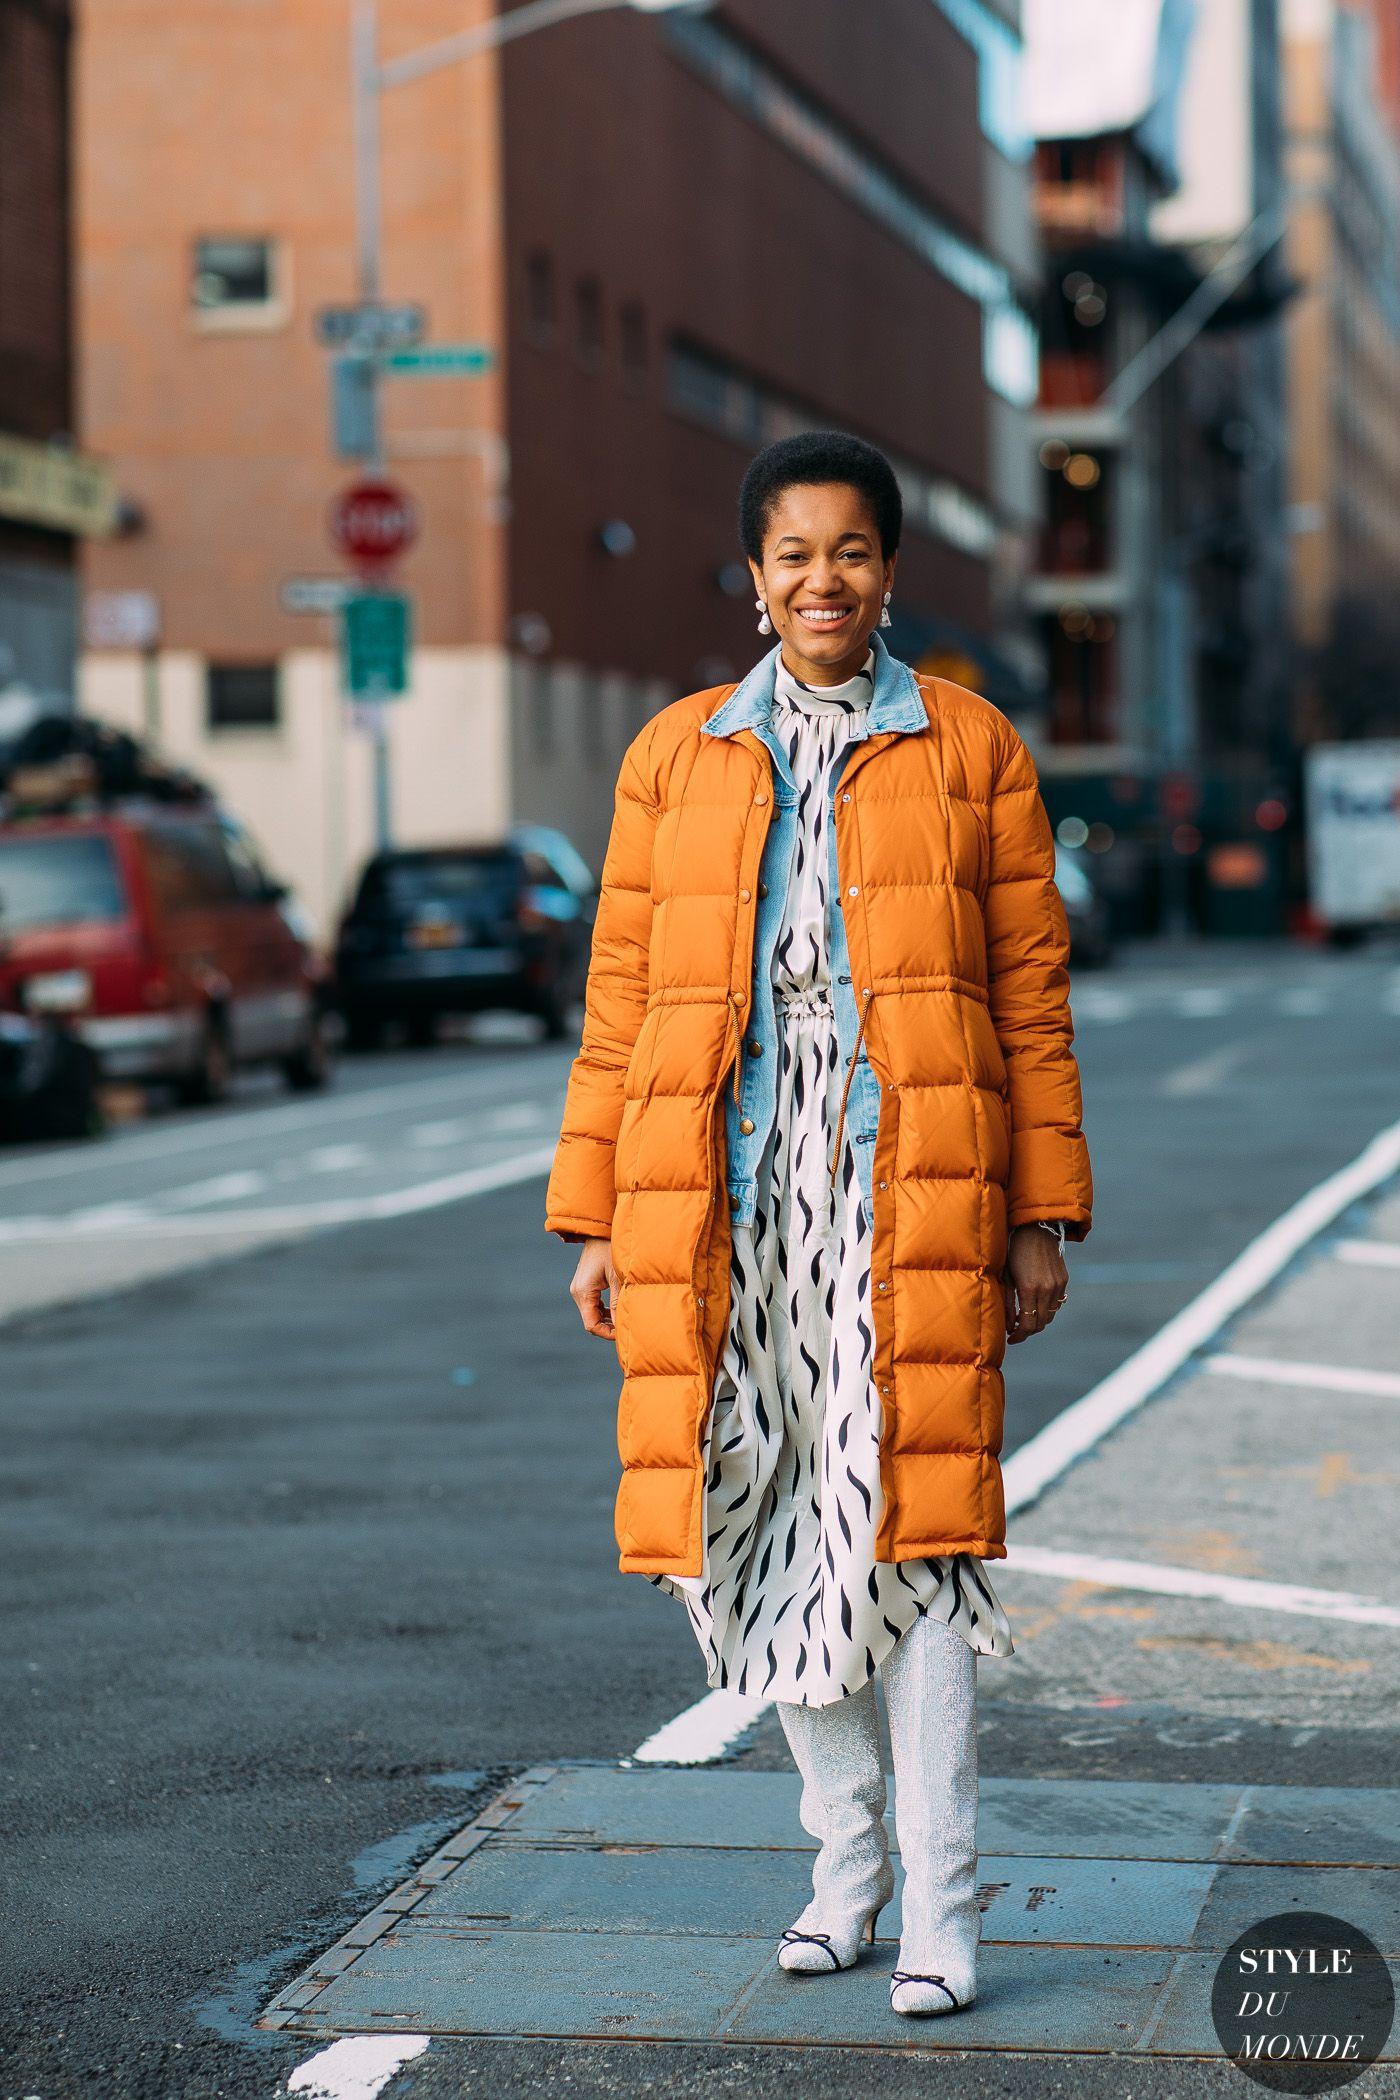 Tamu Mcpherson Blog.New York Fw 2018 Street Style Tamu Mcpherson Stylee